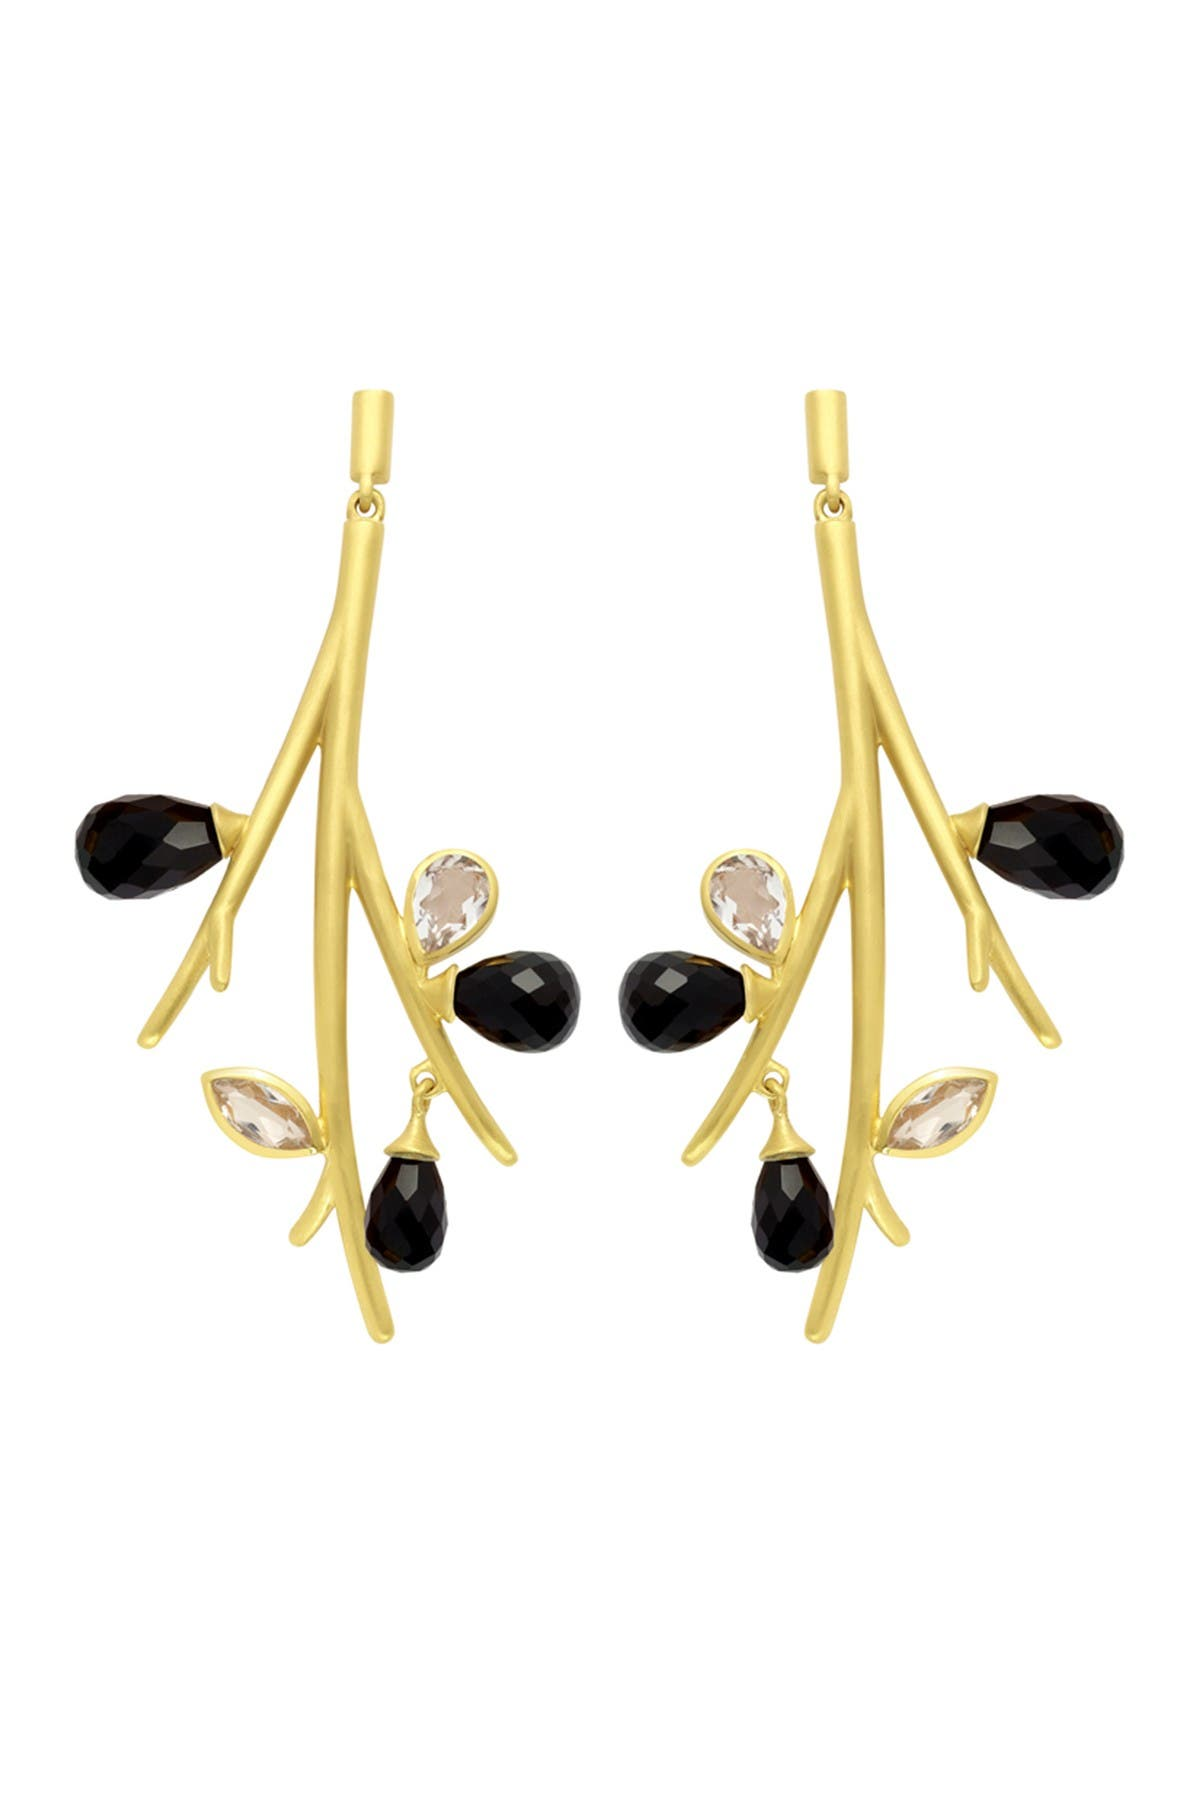 Image of DEAN DAVIDSON 22K Gold Plated Sakura Statement Earrings